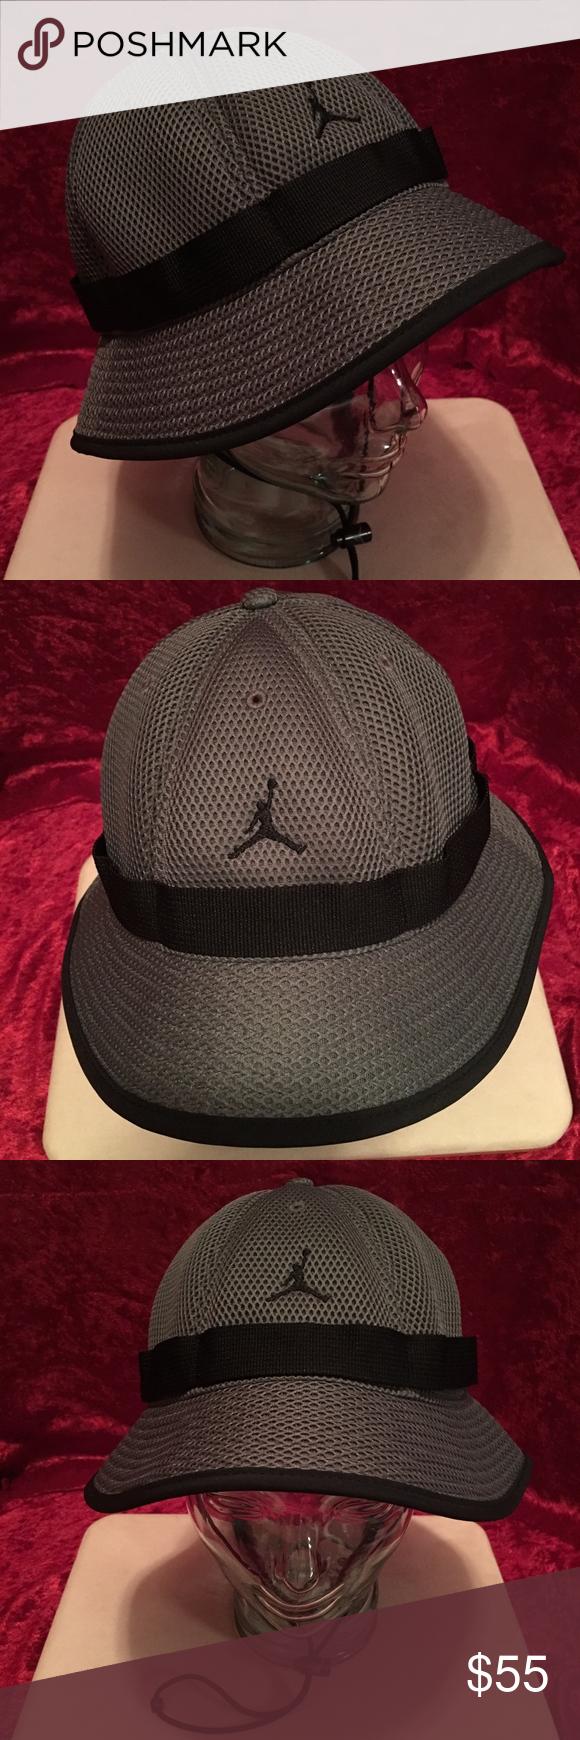 308cb44a508 ... cheap new jordan mesh dark gray black bucket hat unisex new michael  jordan mesh jersey material